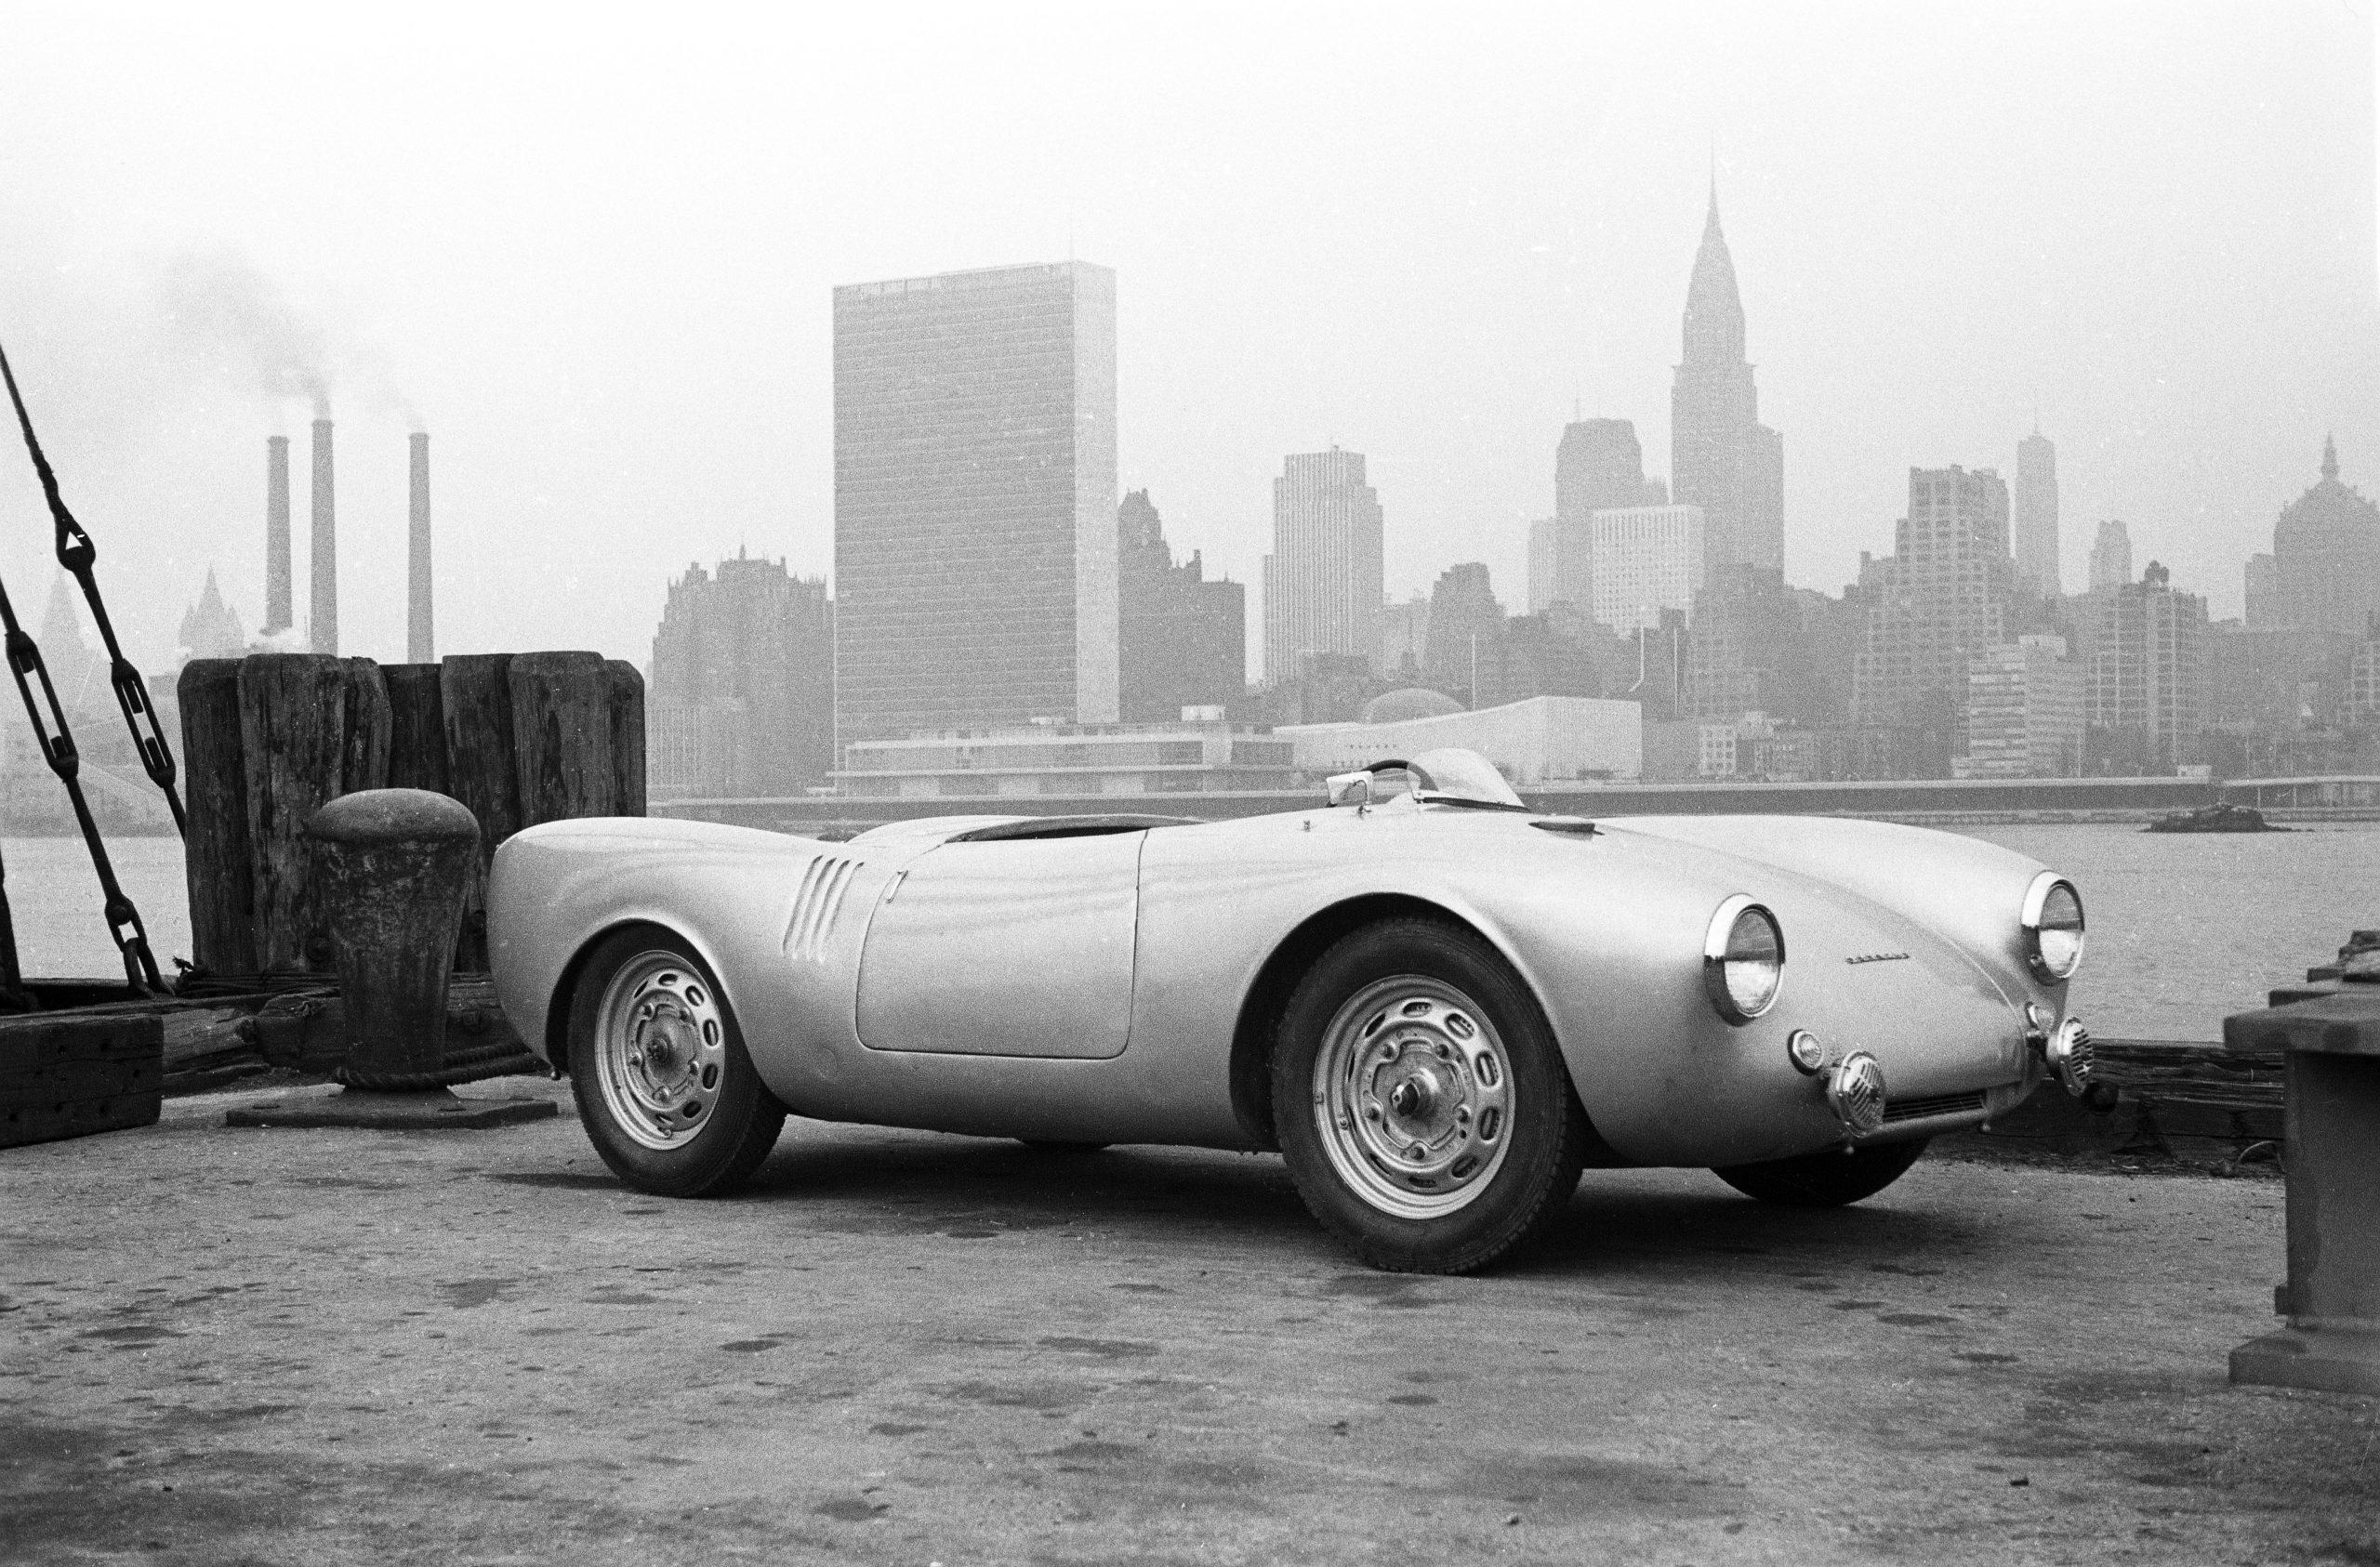 1953 new york porsche 550 manhattan skyline backdrop before carrera panamericana